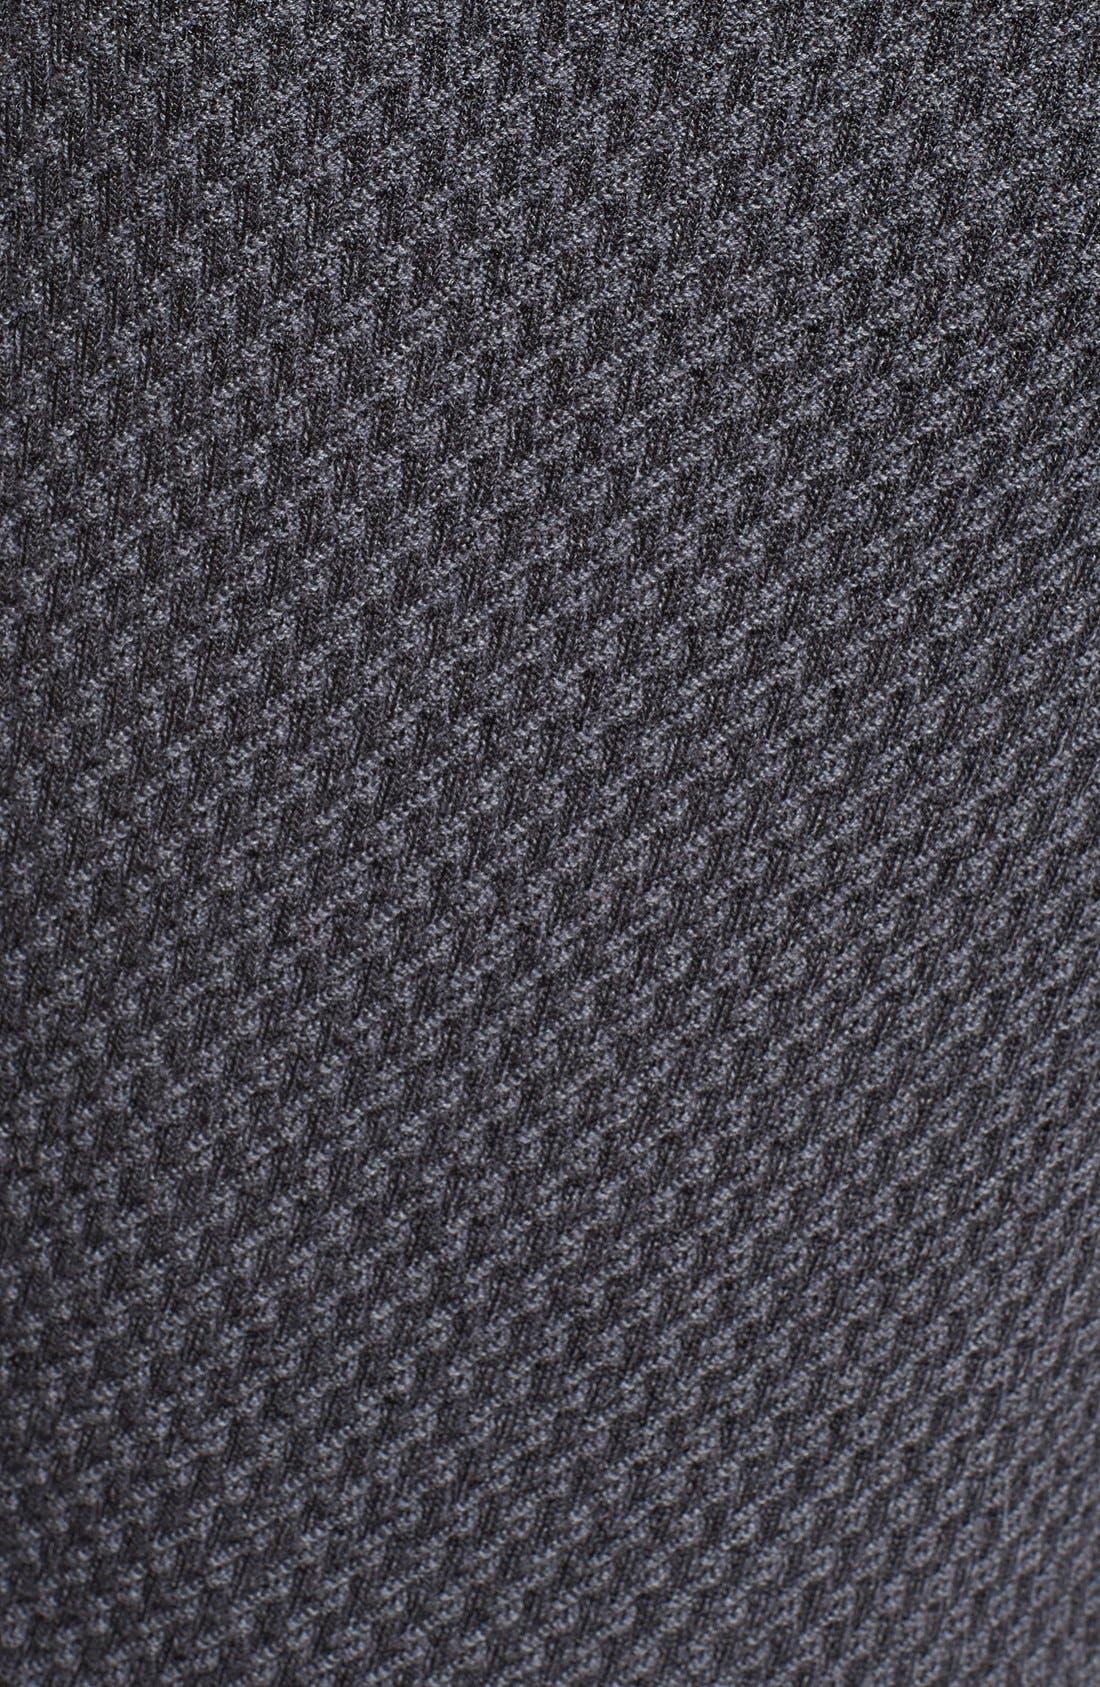 Alternate Image 5  - rag & bone 'Jaime' CrewneckSweater (Nordstrom Exclusive)